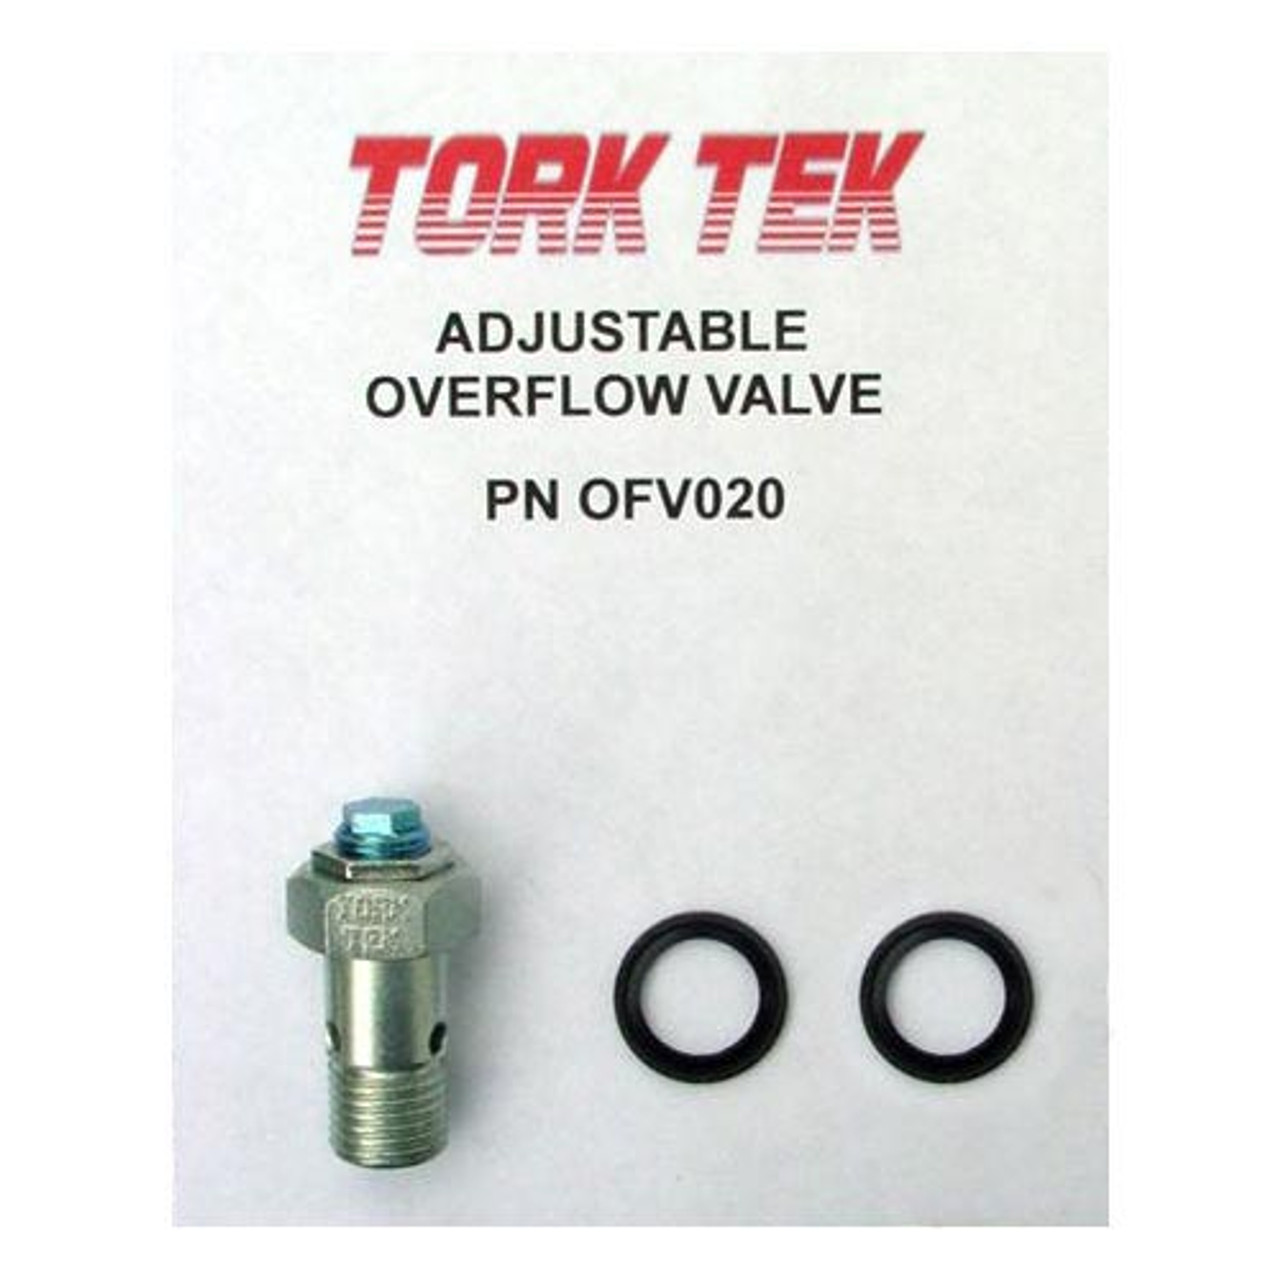 Tork Teknology P7100 High Performance Overflow Valve OFV060HP